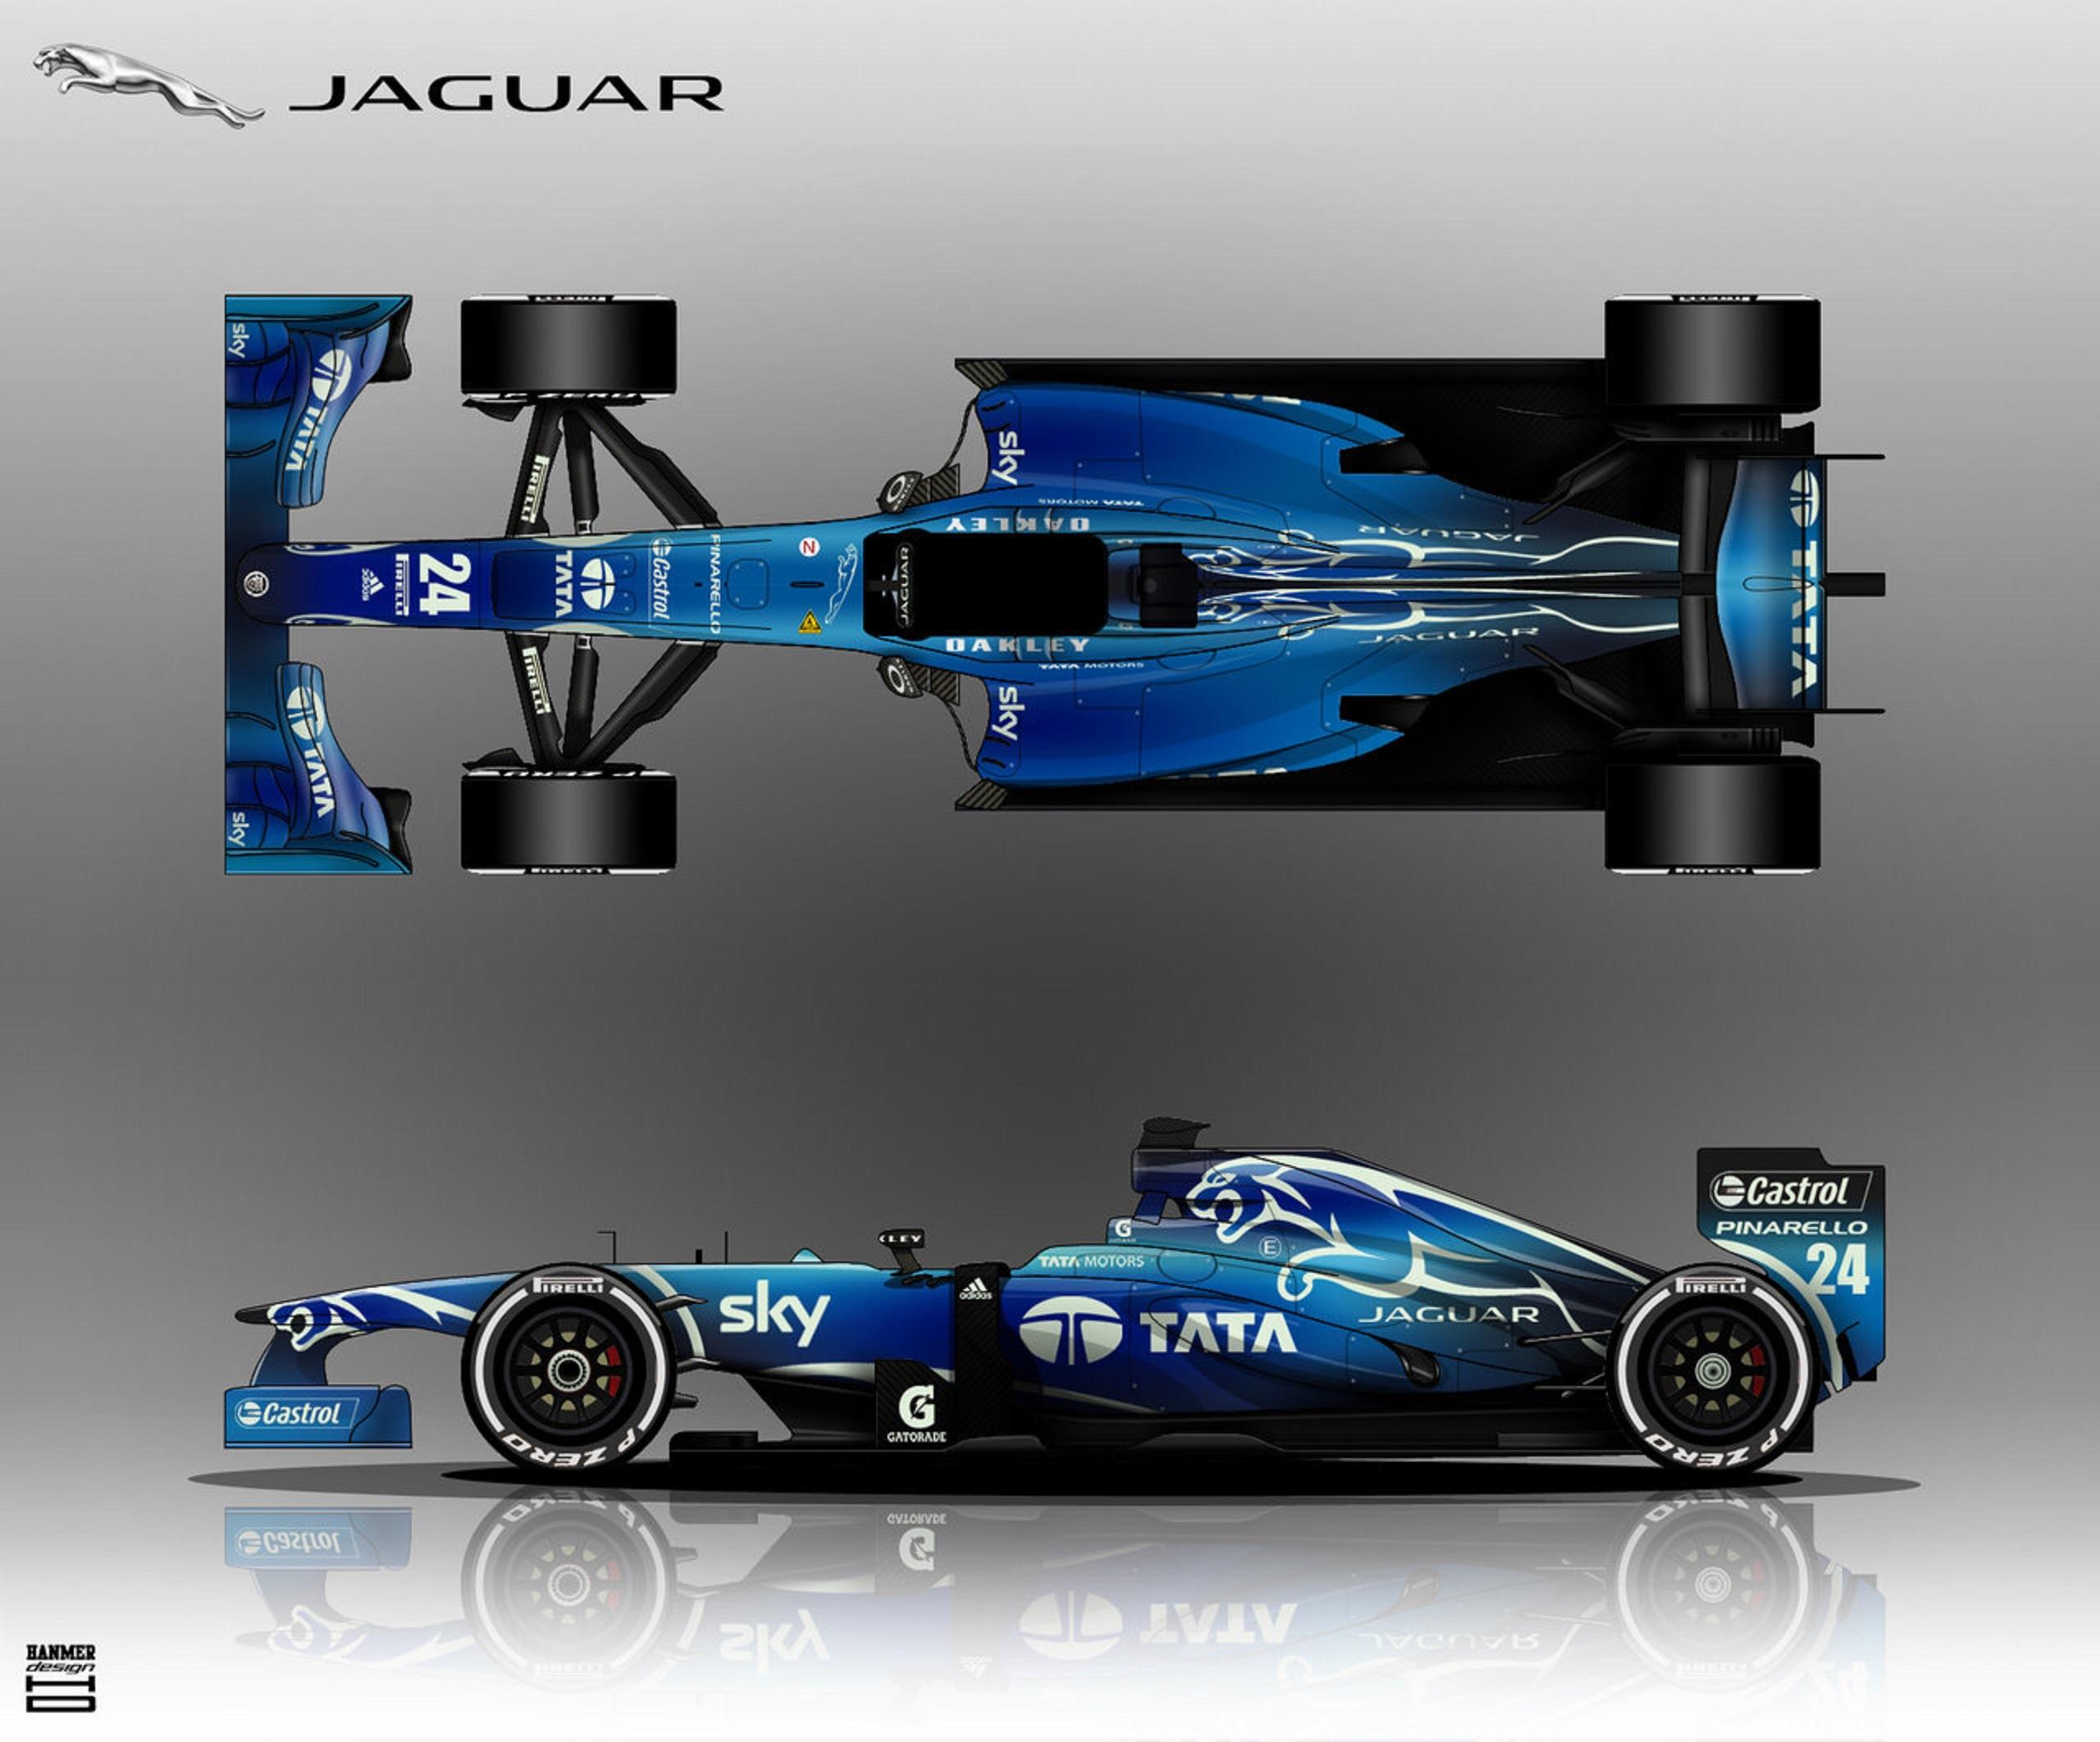 jaguar_r6_by_hanmer-d6gw0rn.jpg